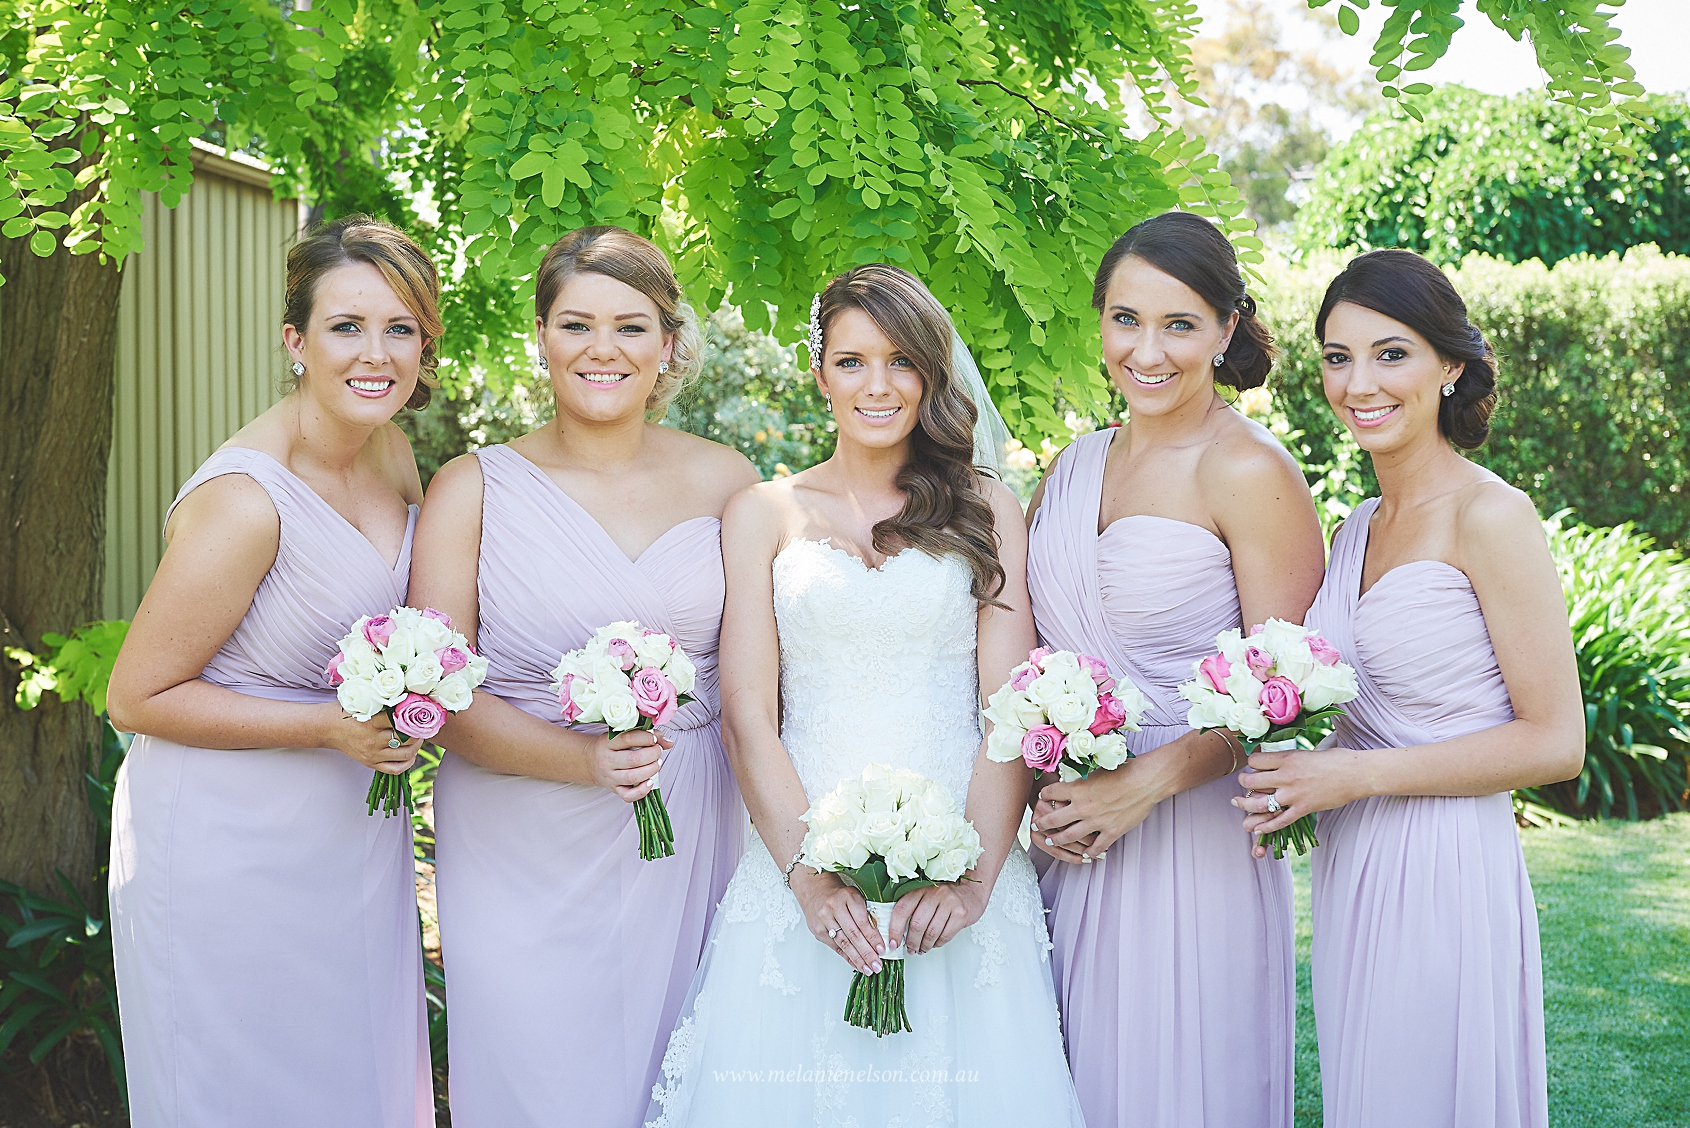 adelaide_wedding_photographer_009.jpg